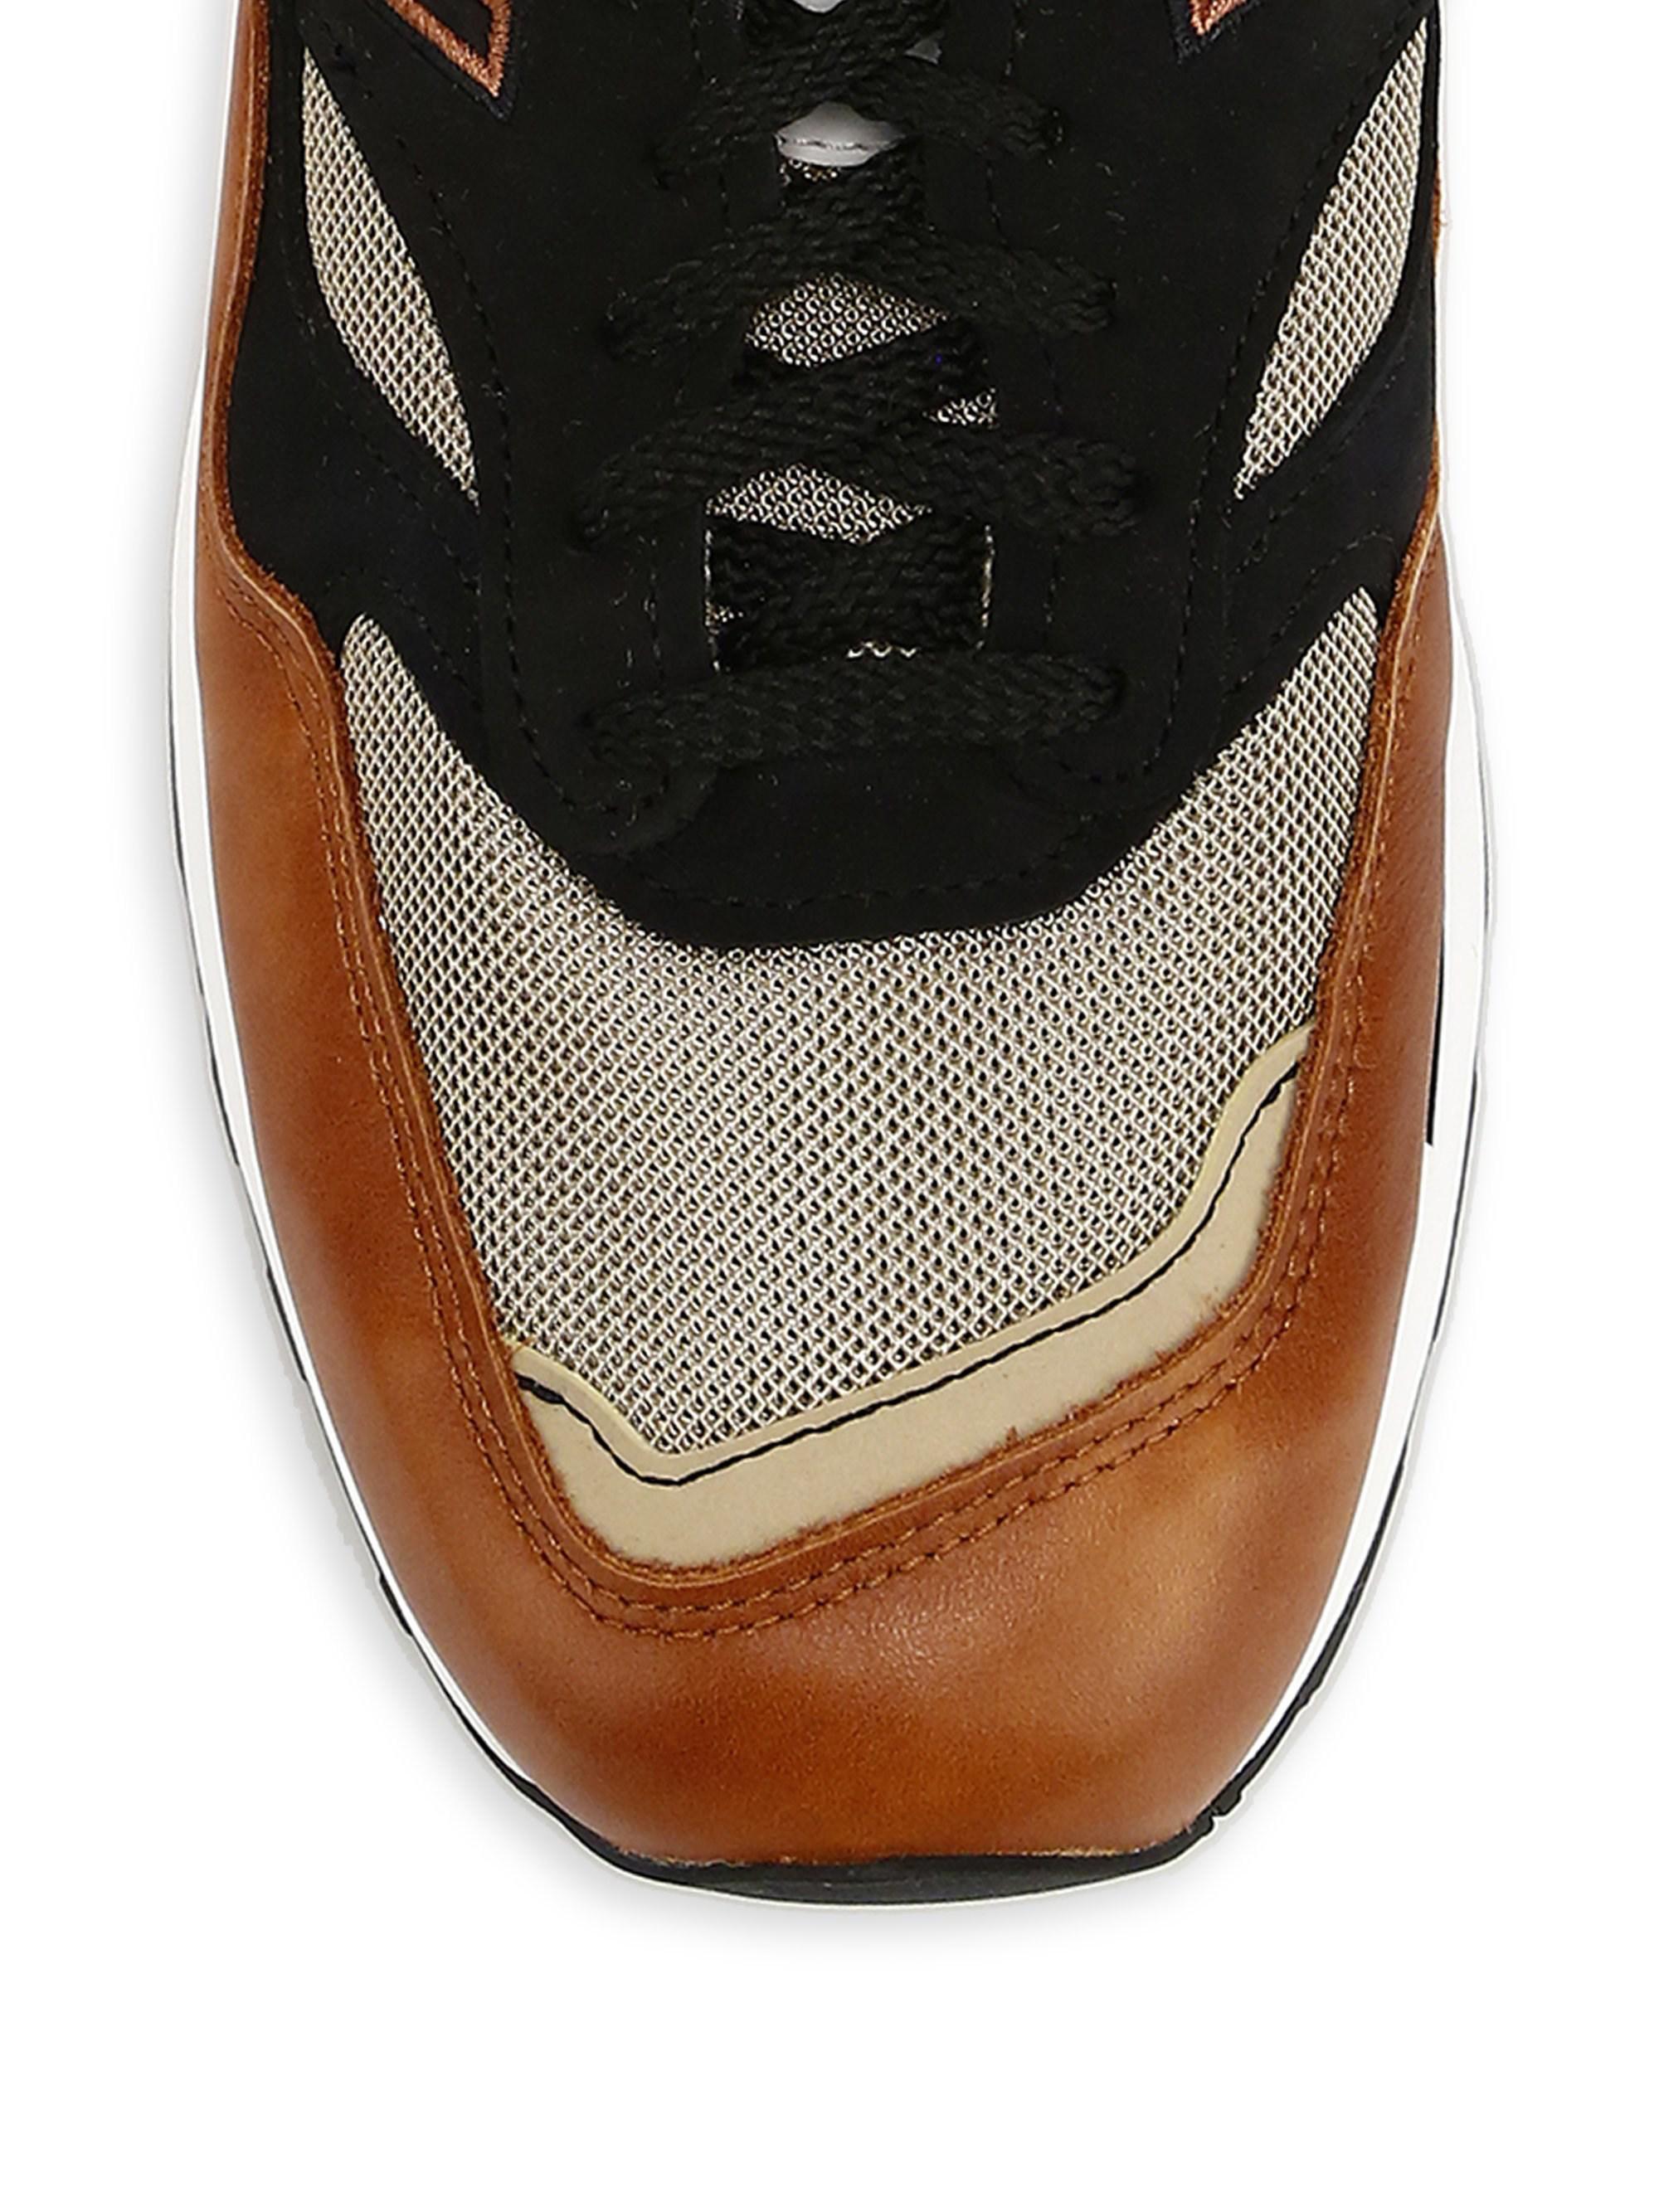 new balance 1500 leather